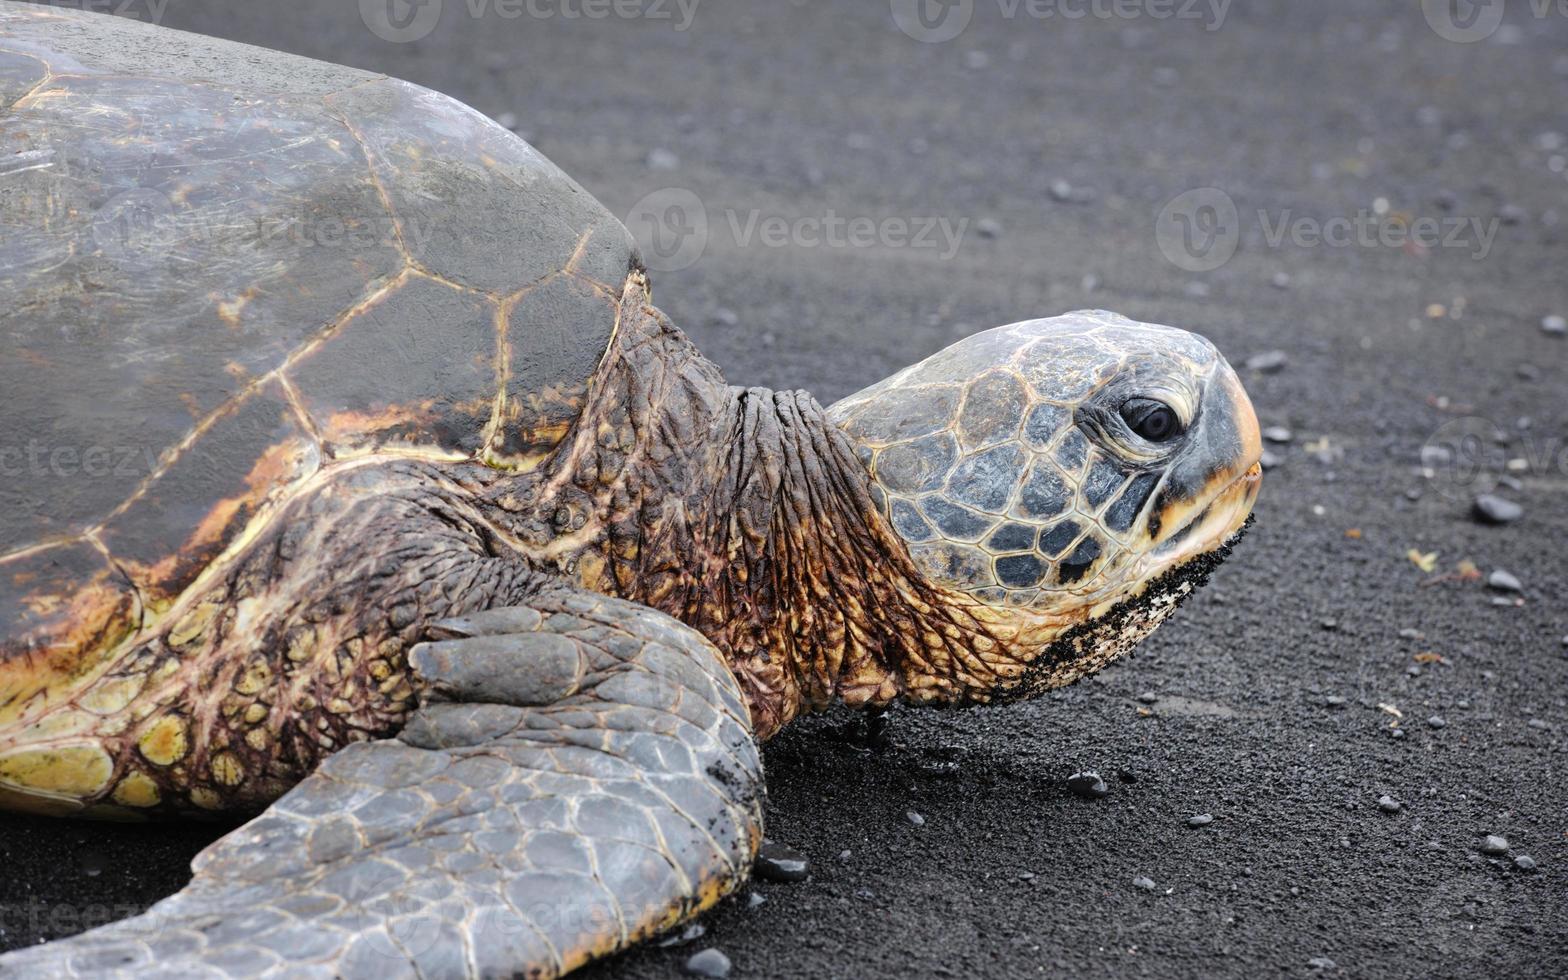 tartaruga verde ameaçada de extinção na vida selvagem, Havaí (xxxl) foto